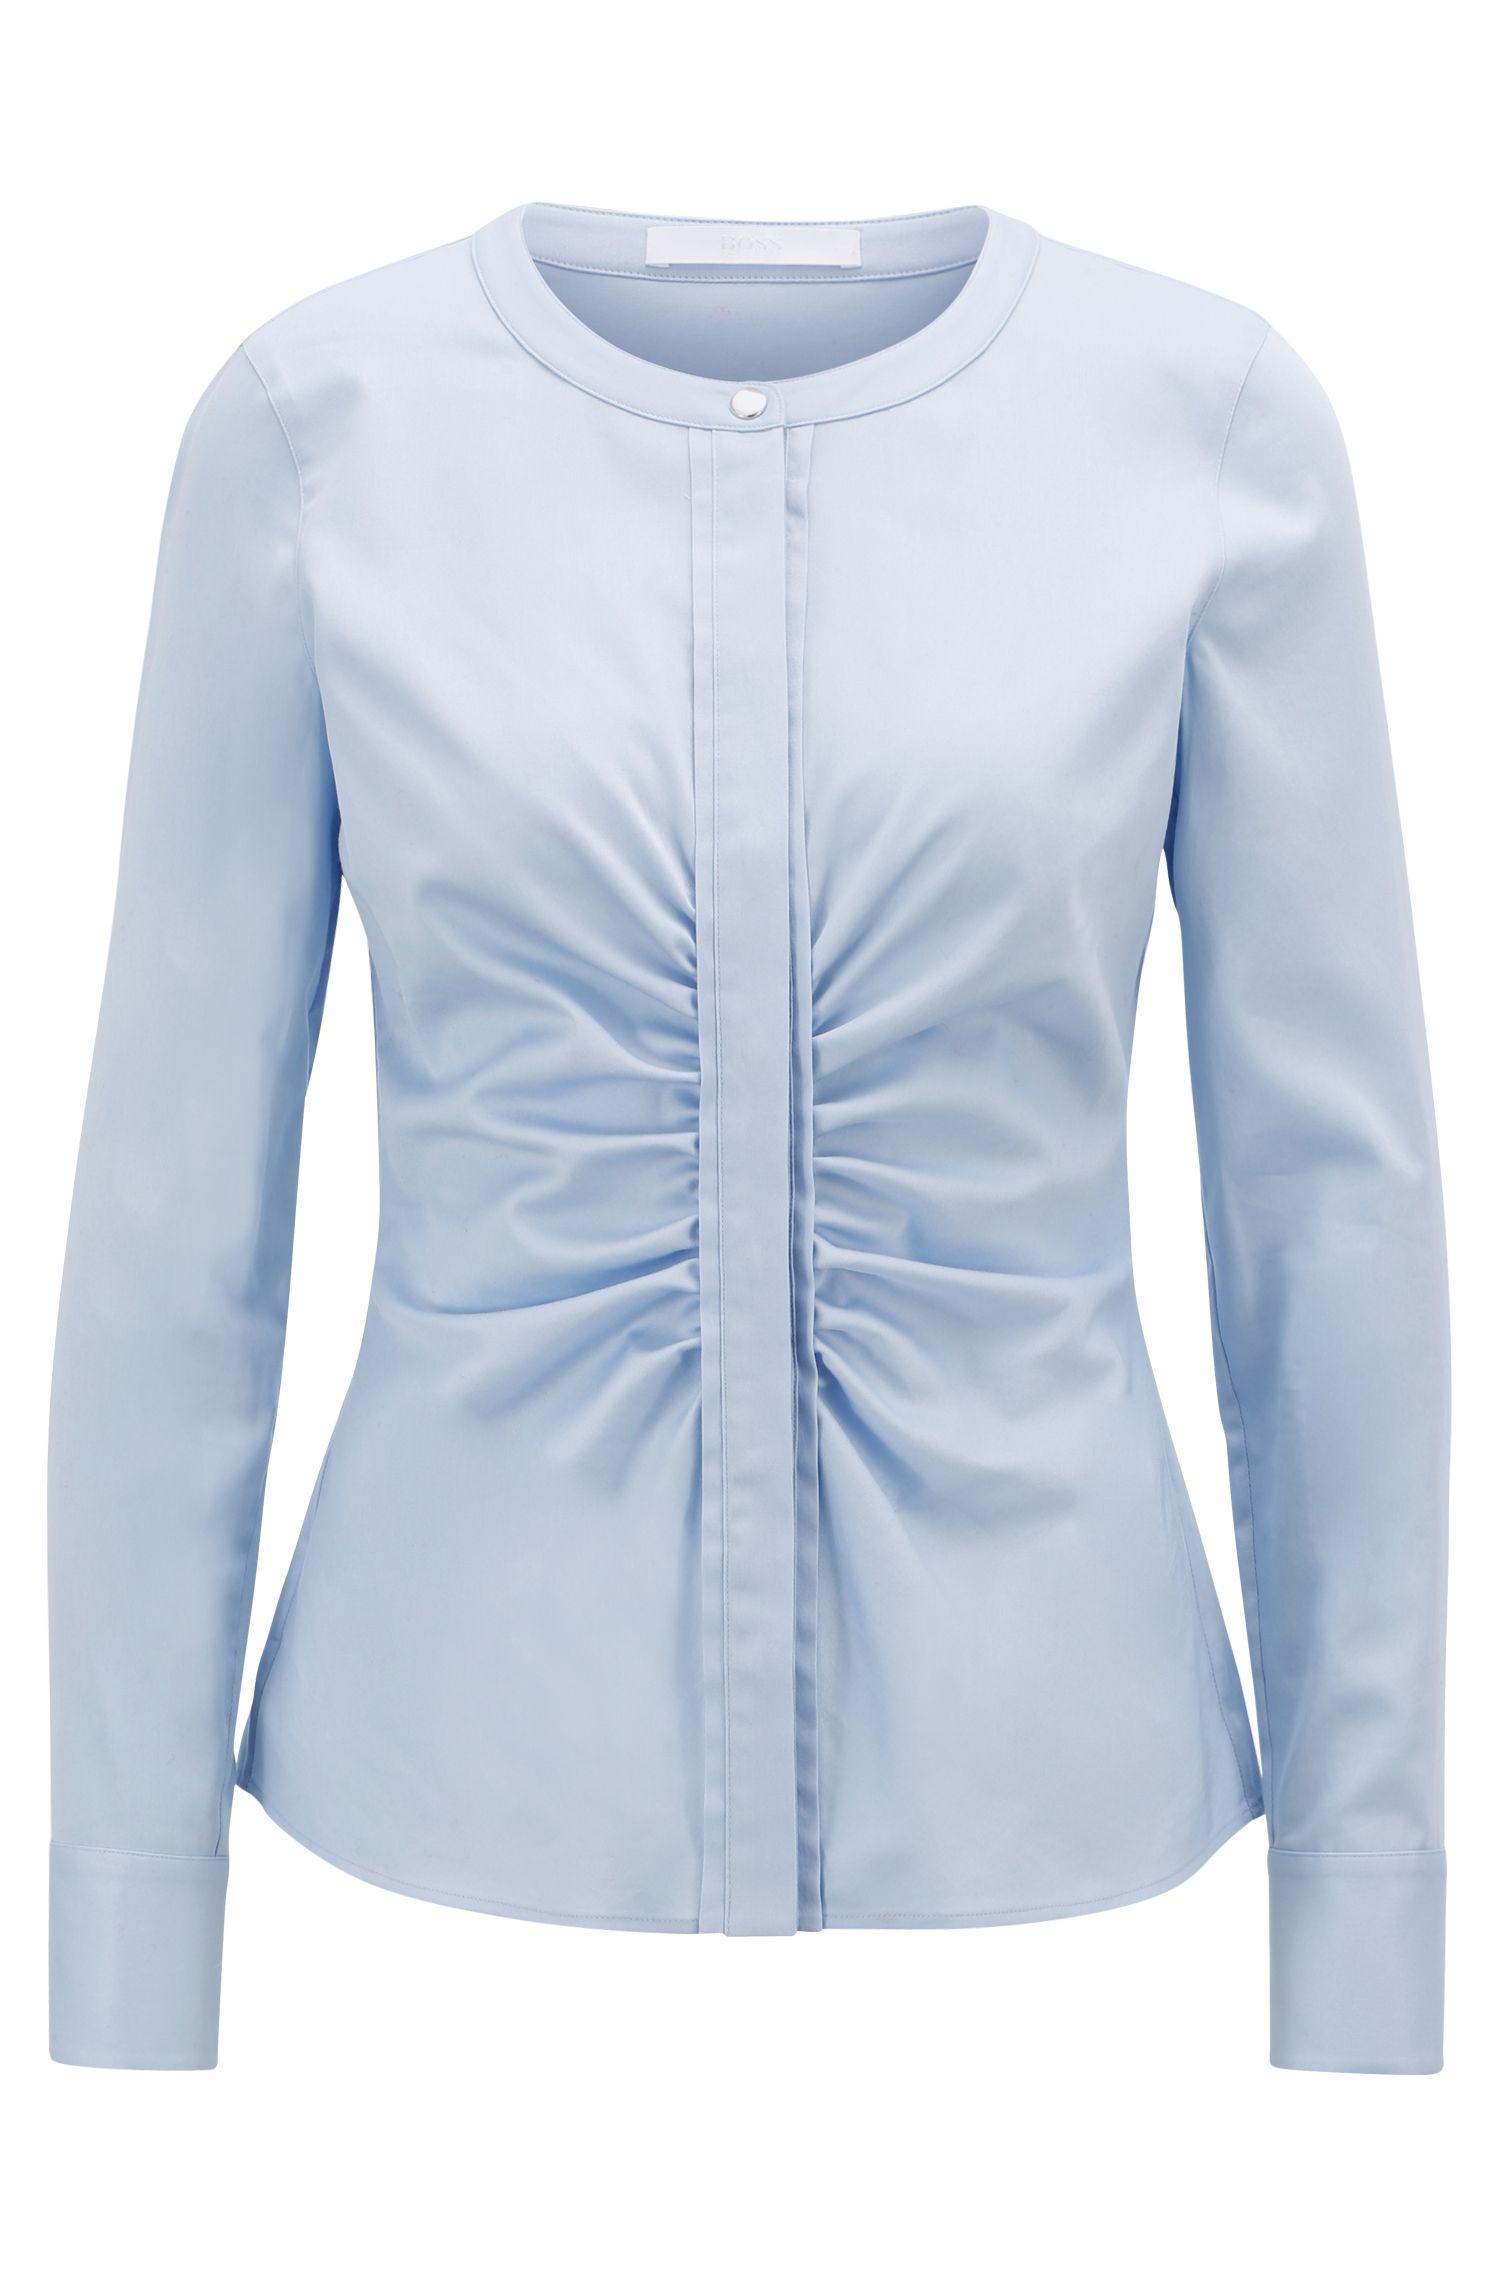 Kraagloze blouse van stretchsatijn met ruchedetail, Lichtblauw